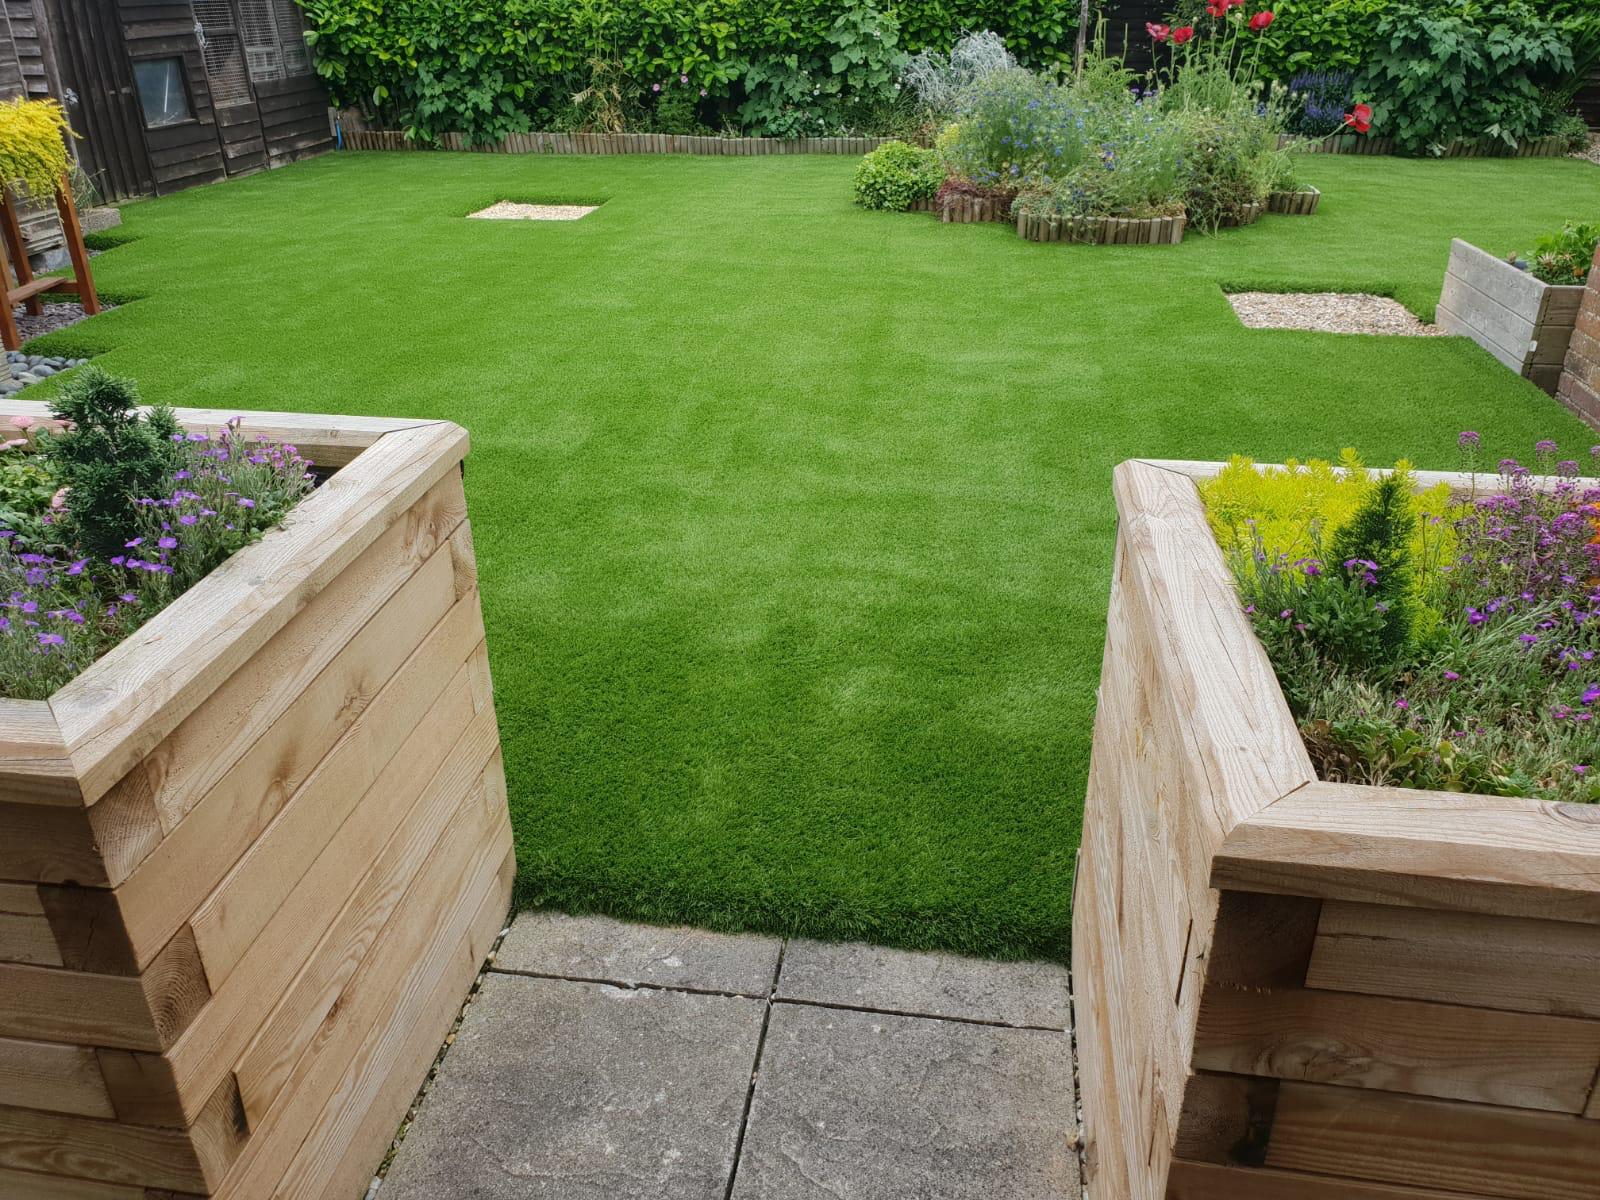 Artificial Grass Installation project using Mayfair astroturf.